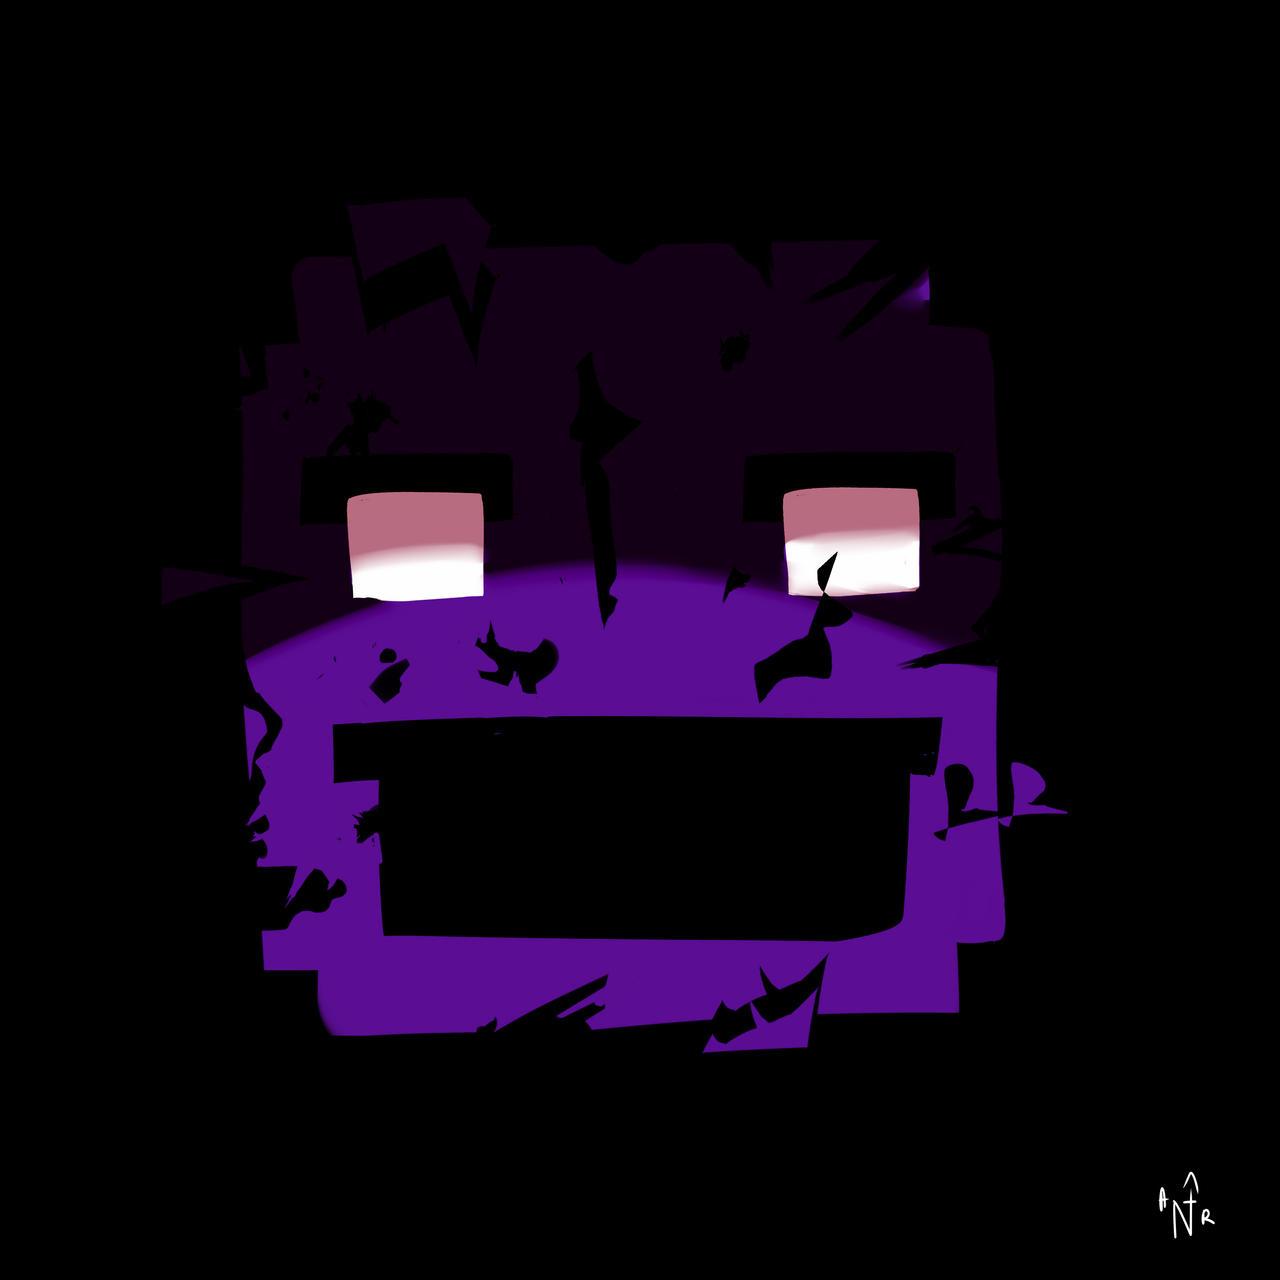 Shattered Purple Guy by burningblazecat